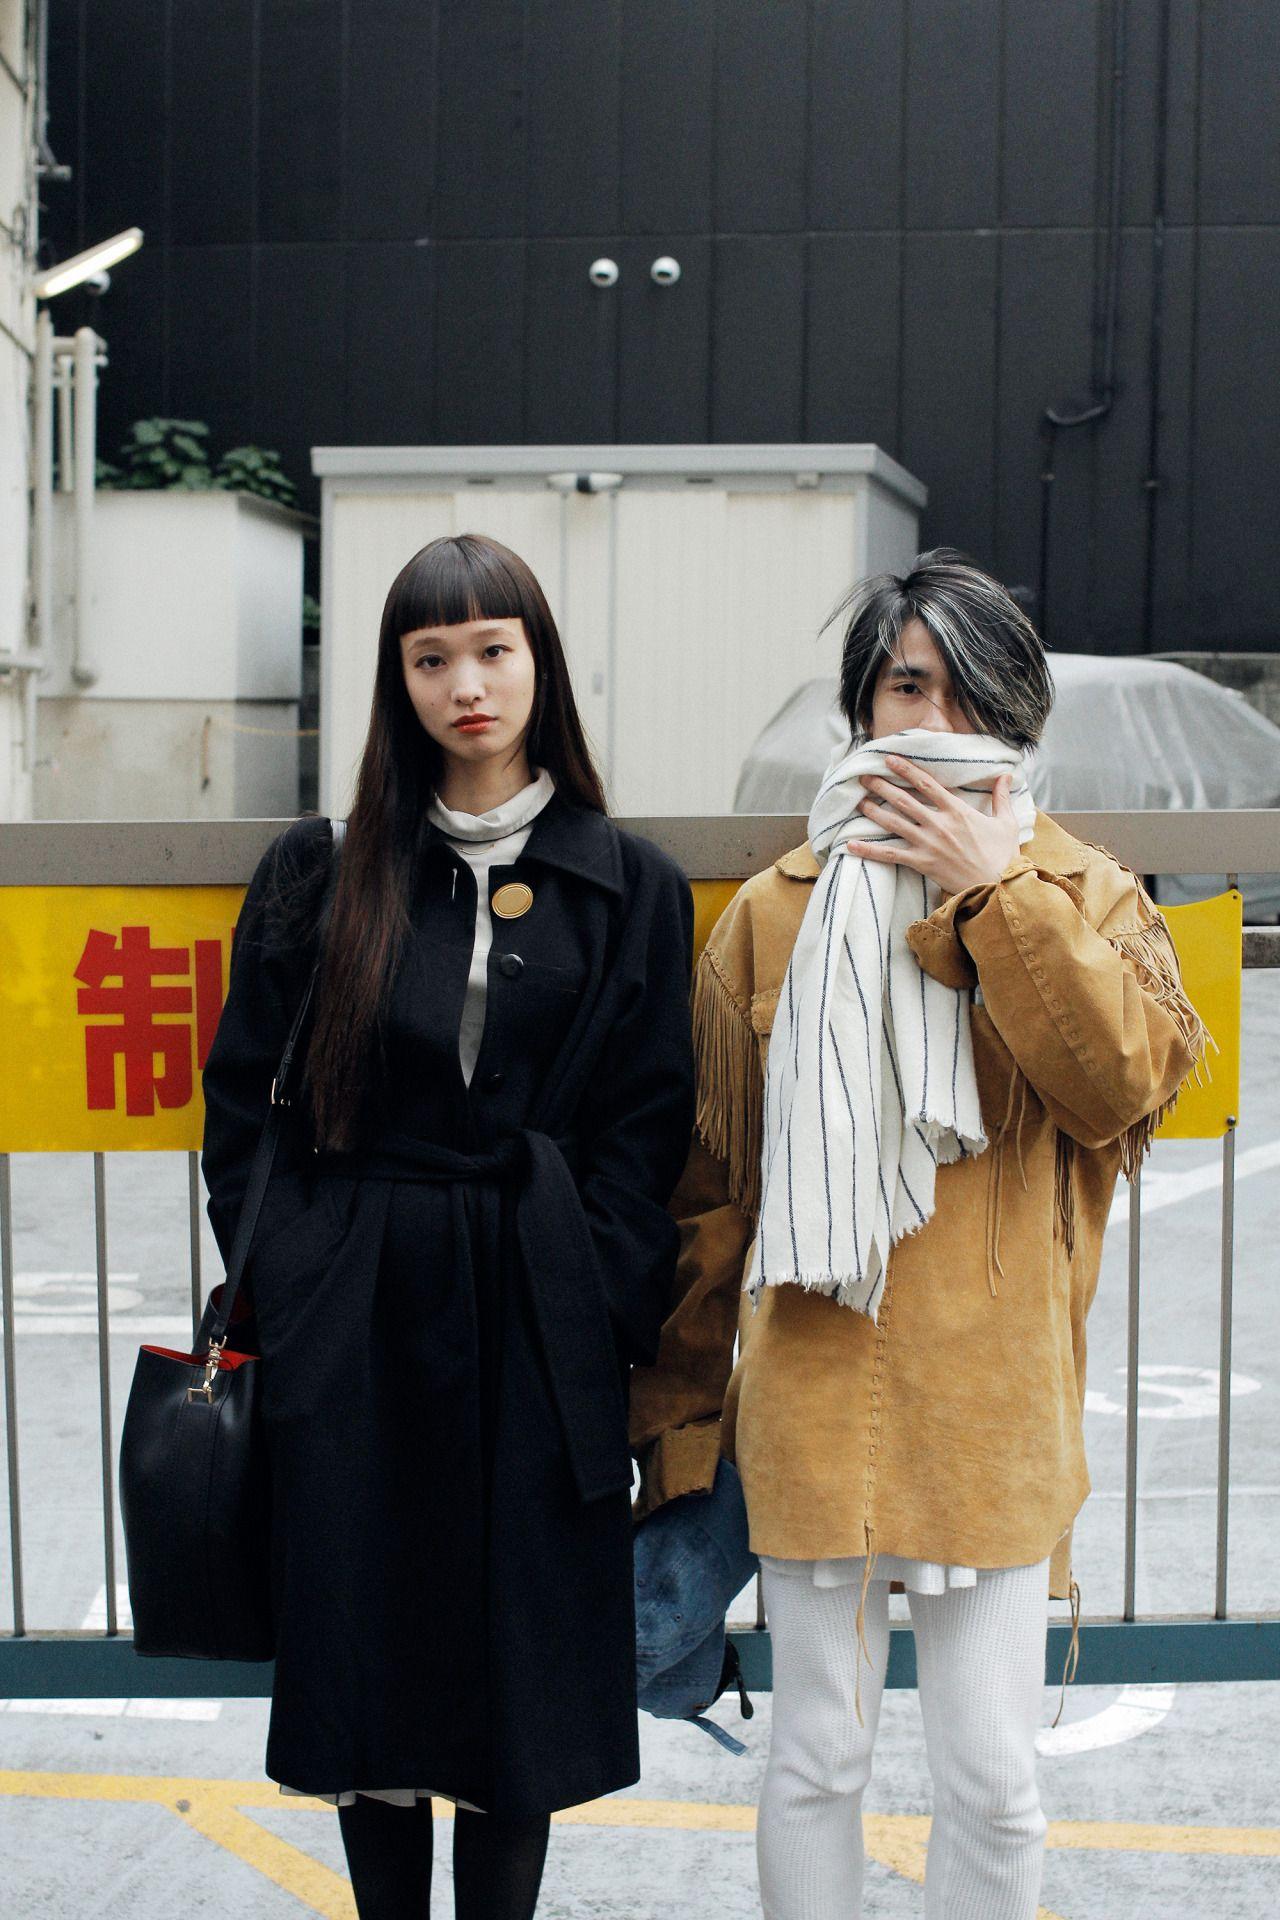 DROPSNAP! YUKA MANNAMI AND HIDETAKA YUKIMARUINSTAGRAM: @drop_tokyo